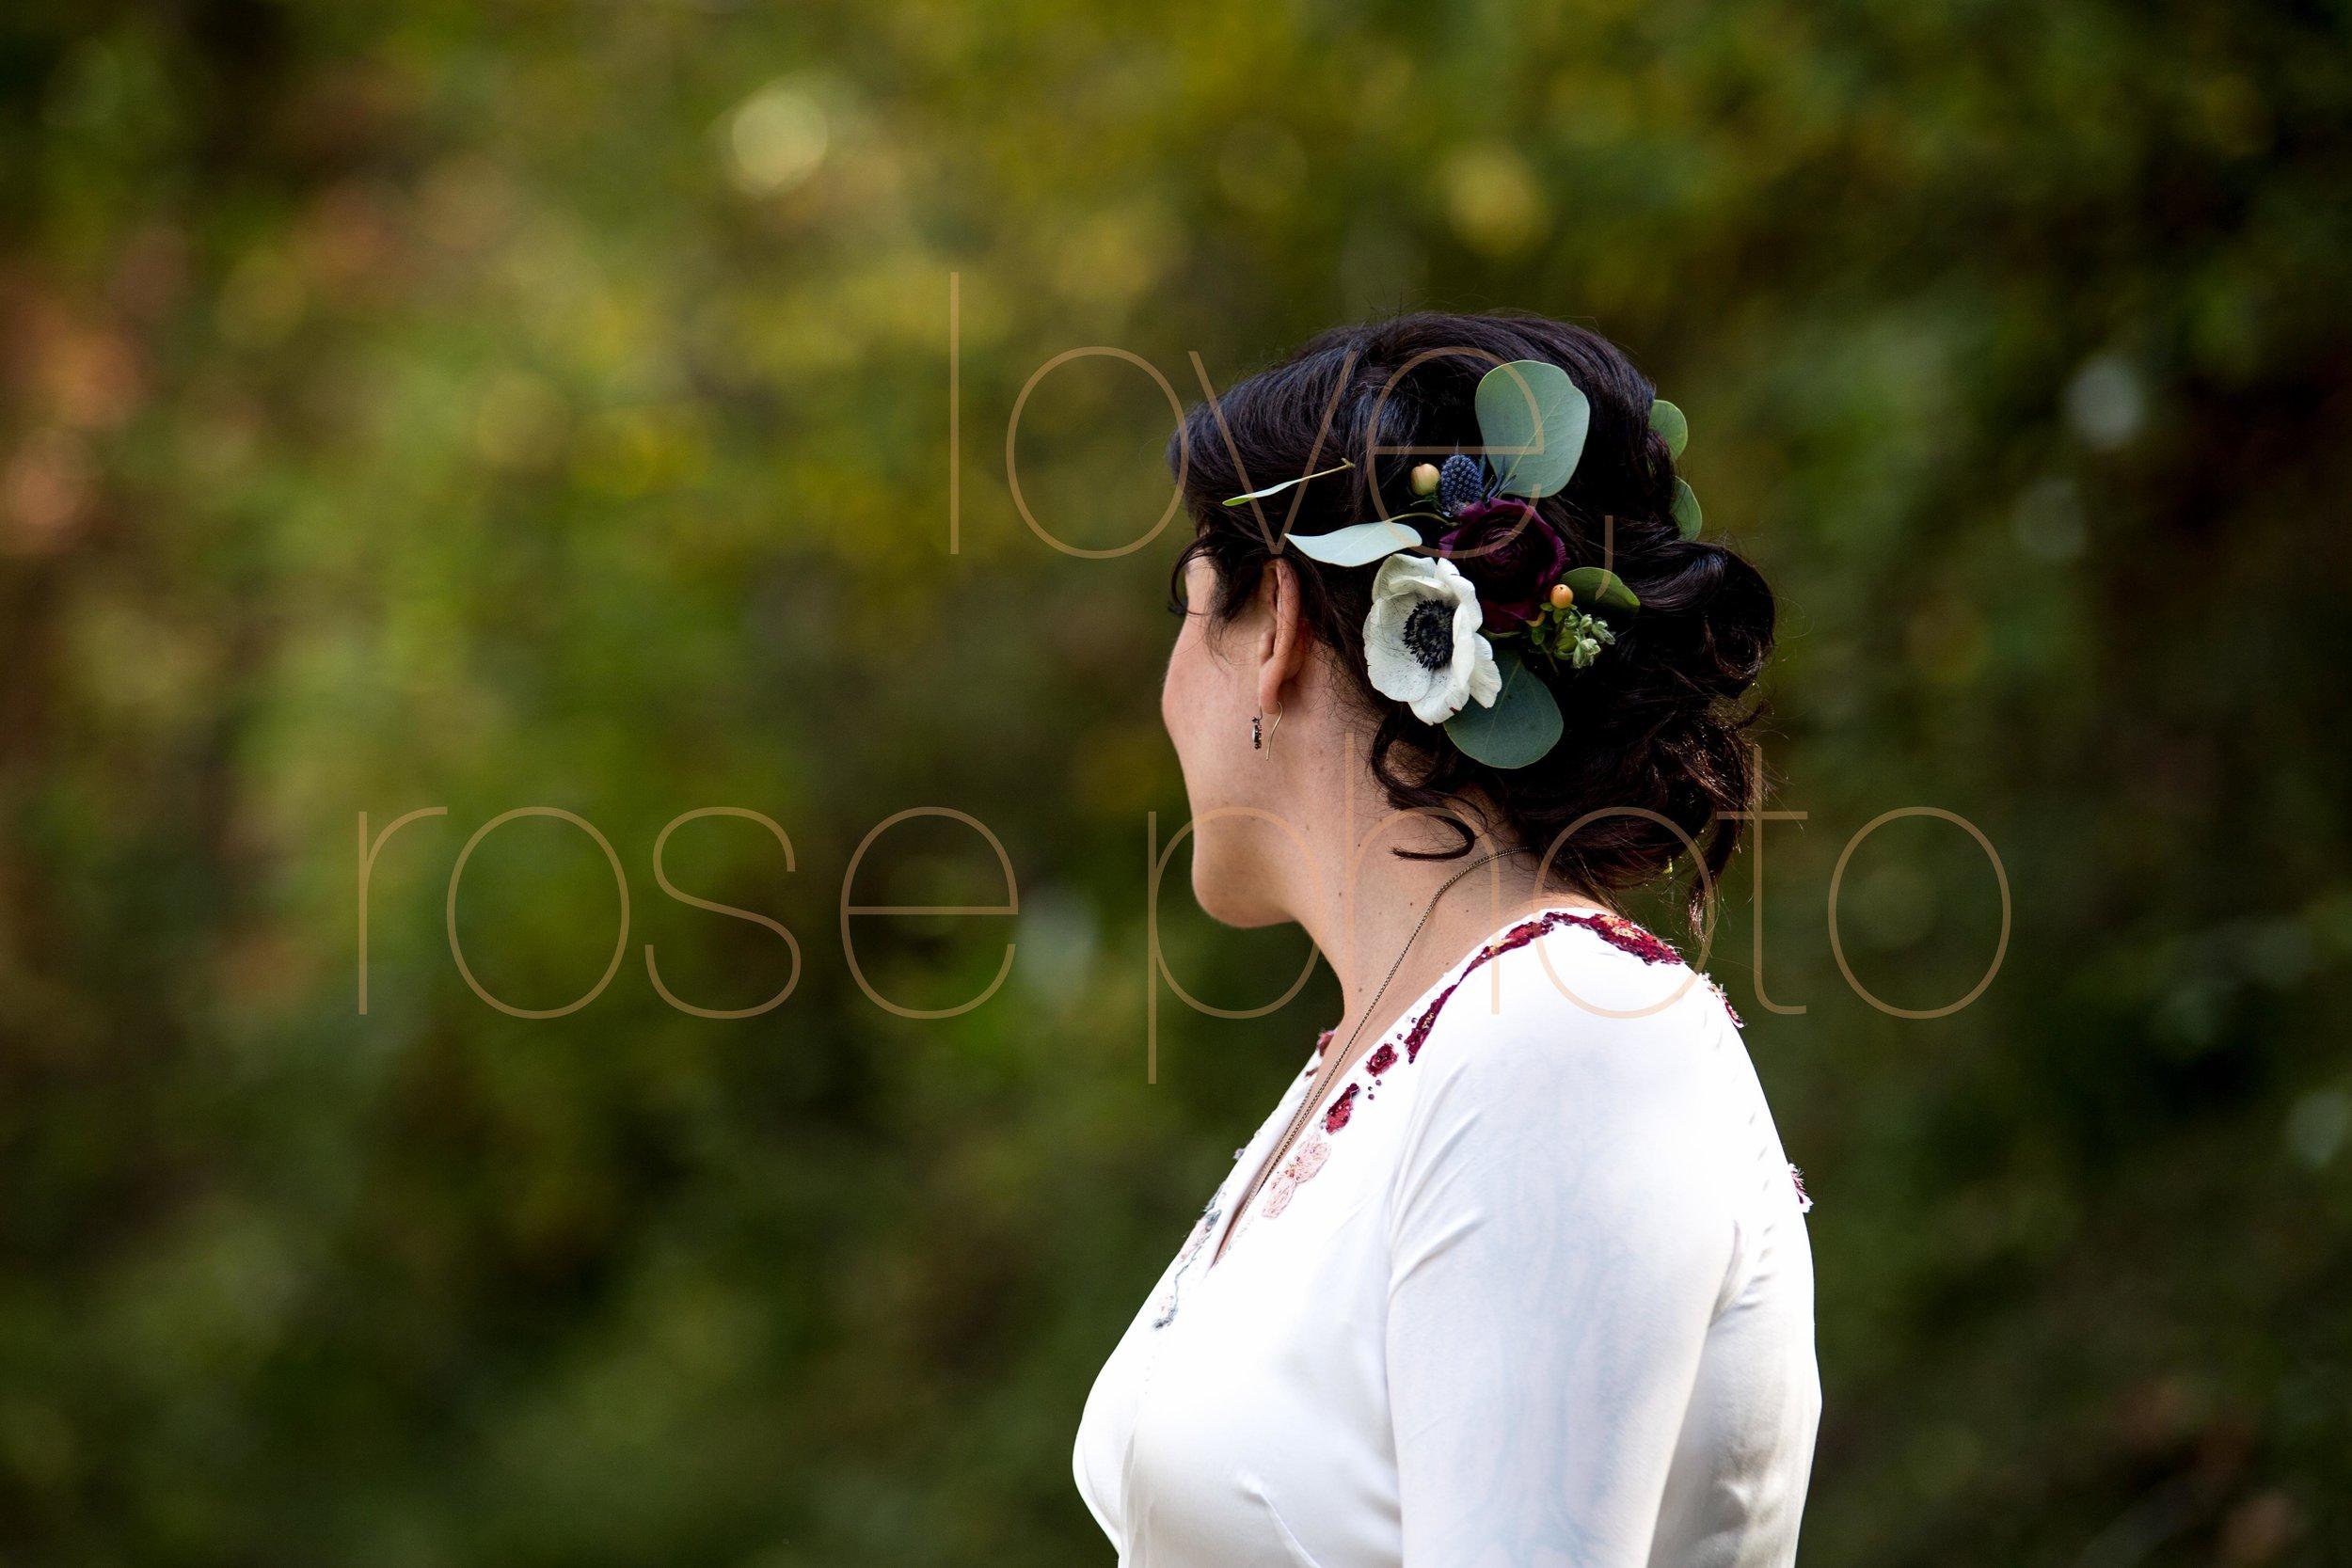 Jane Krame + Jason Ashevegas married asheville best wedding photographers -25.jpg